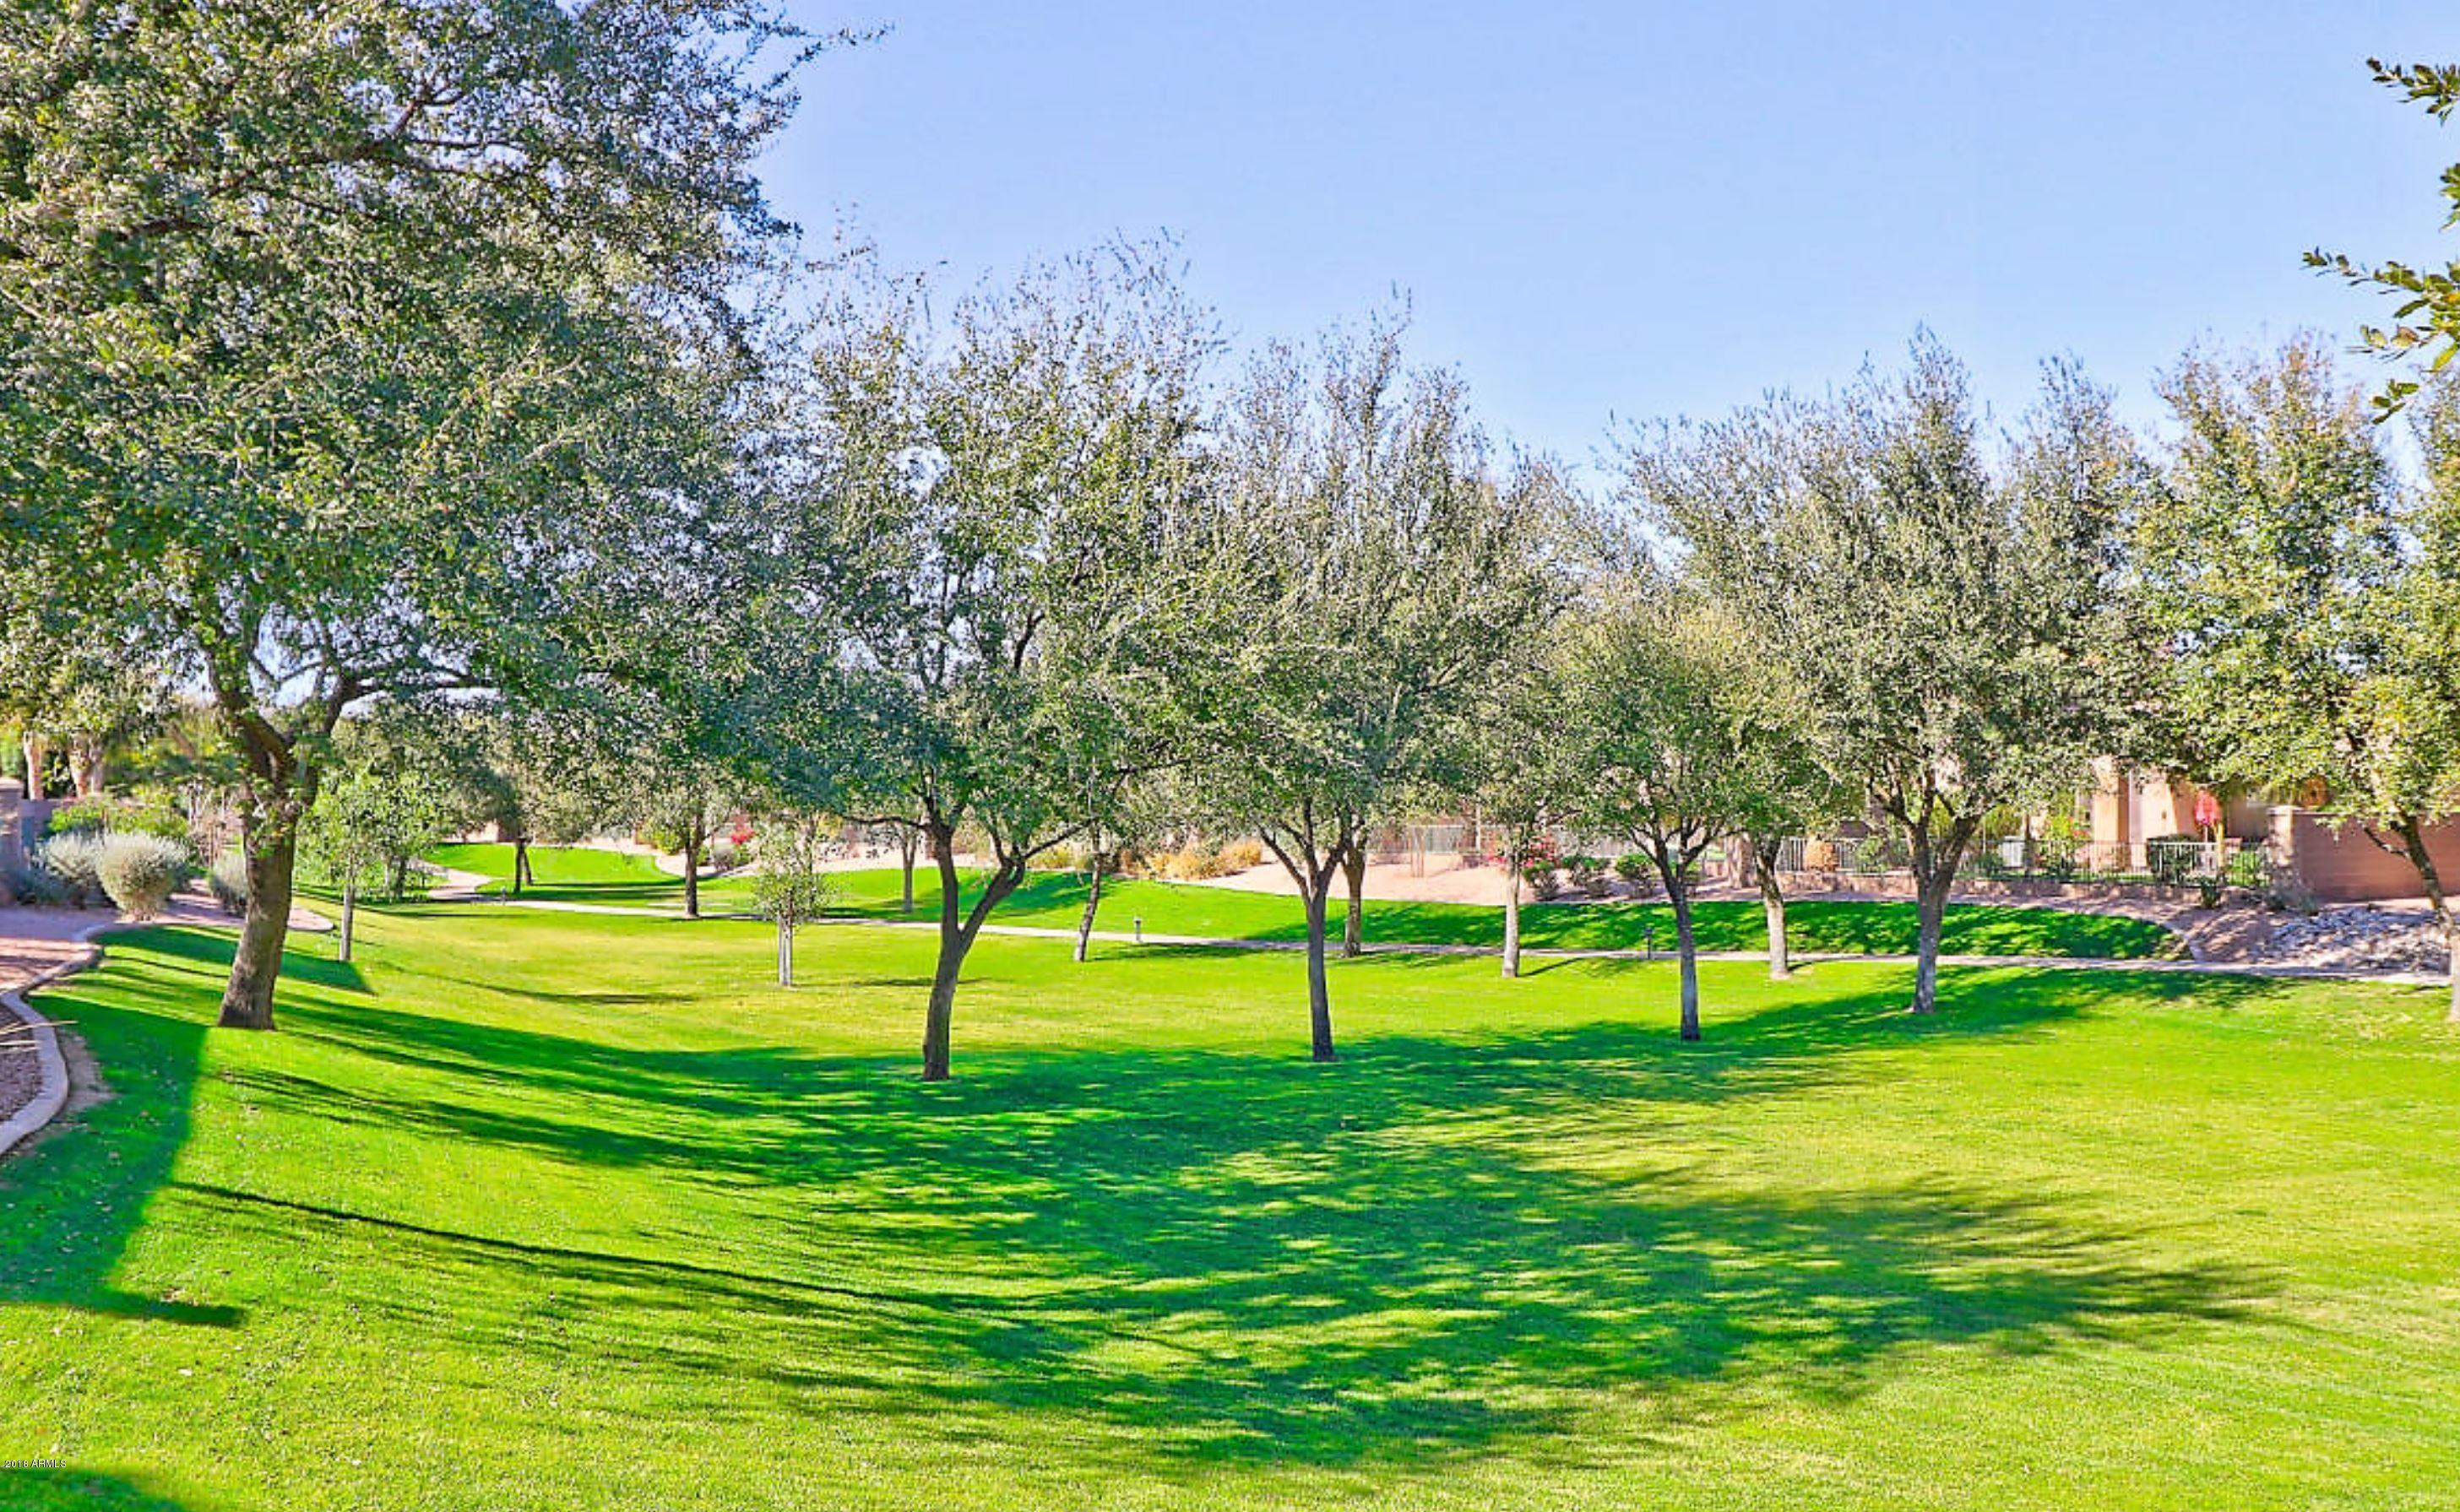 MLS 5847099 1387 W MARLIN Drive Building 1900, Chandler, AZ 85286 Community Pools